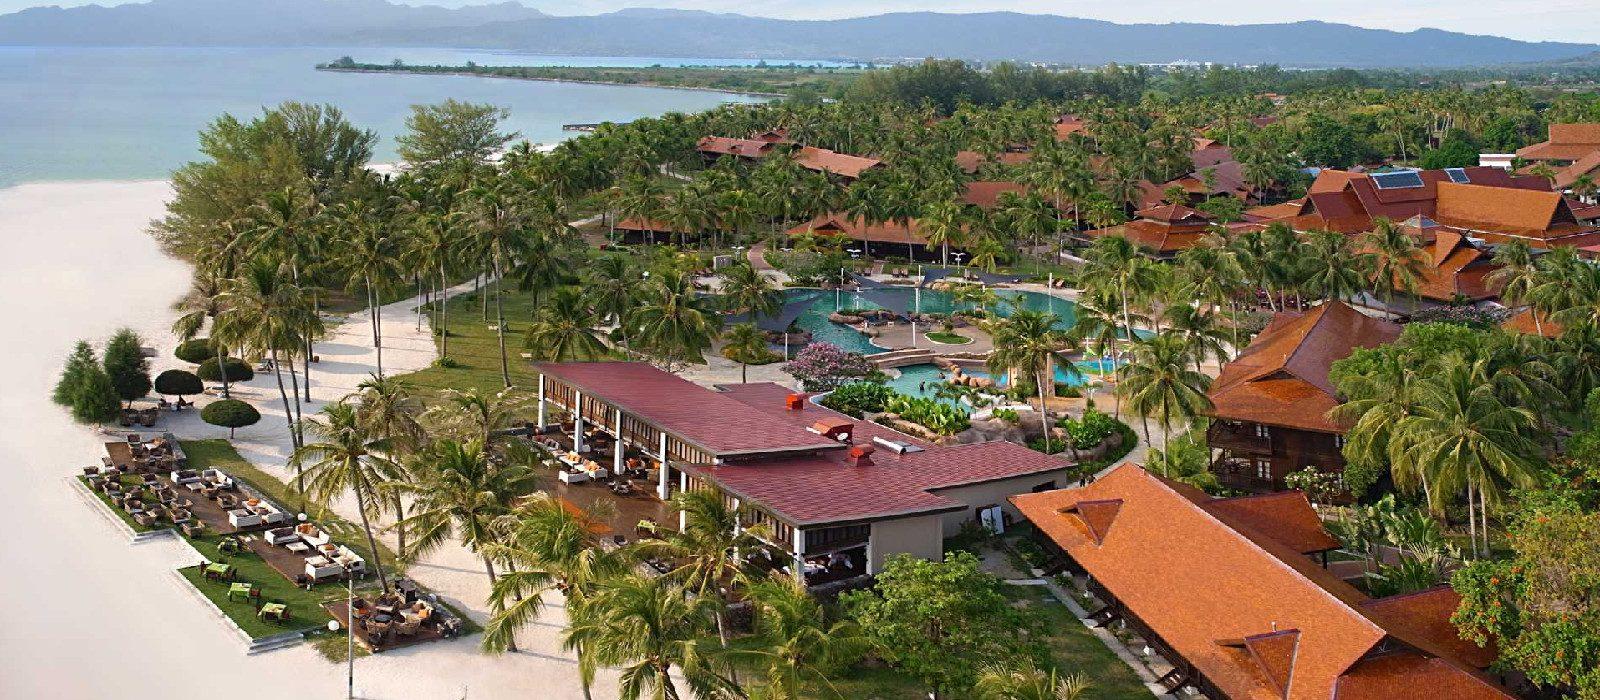 Luxury Langkawi Holiday Packages Meritus Pelangi Beach Resort & Spa Header